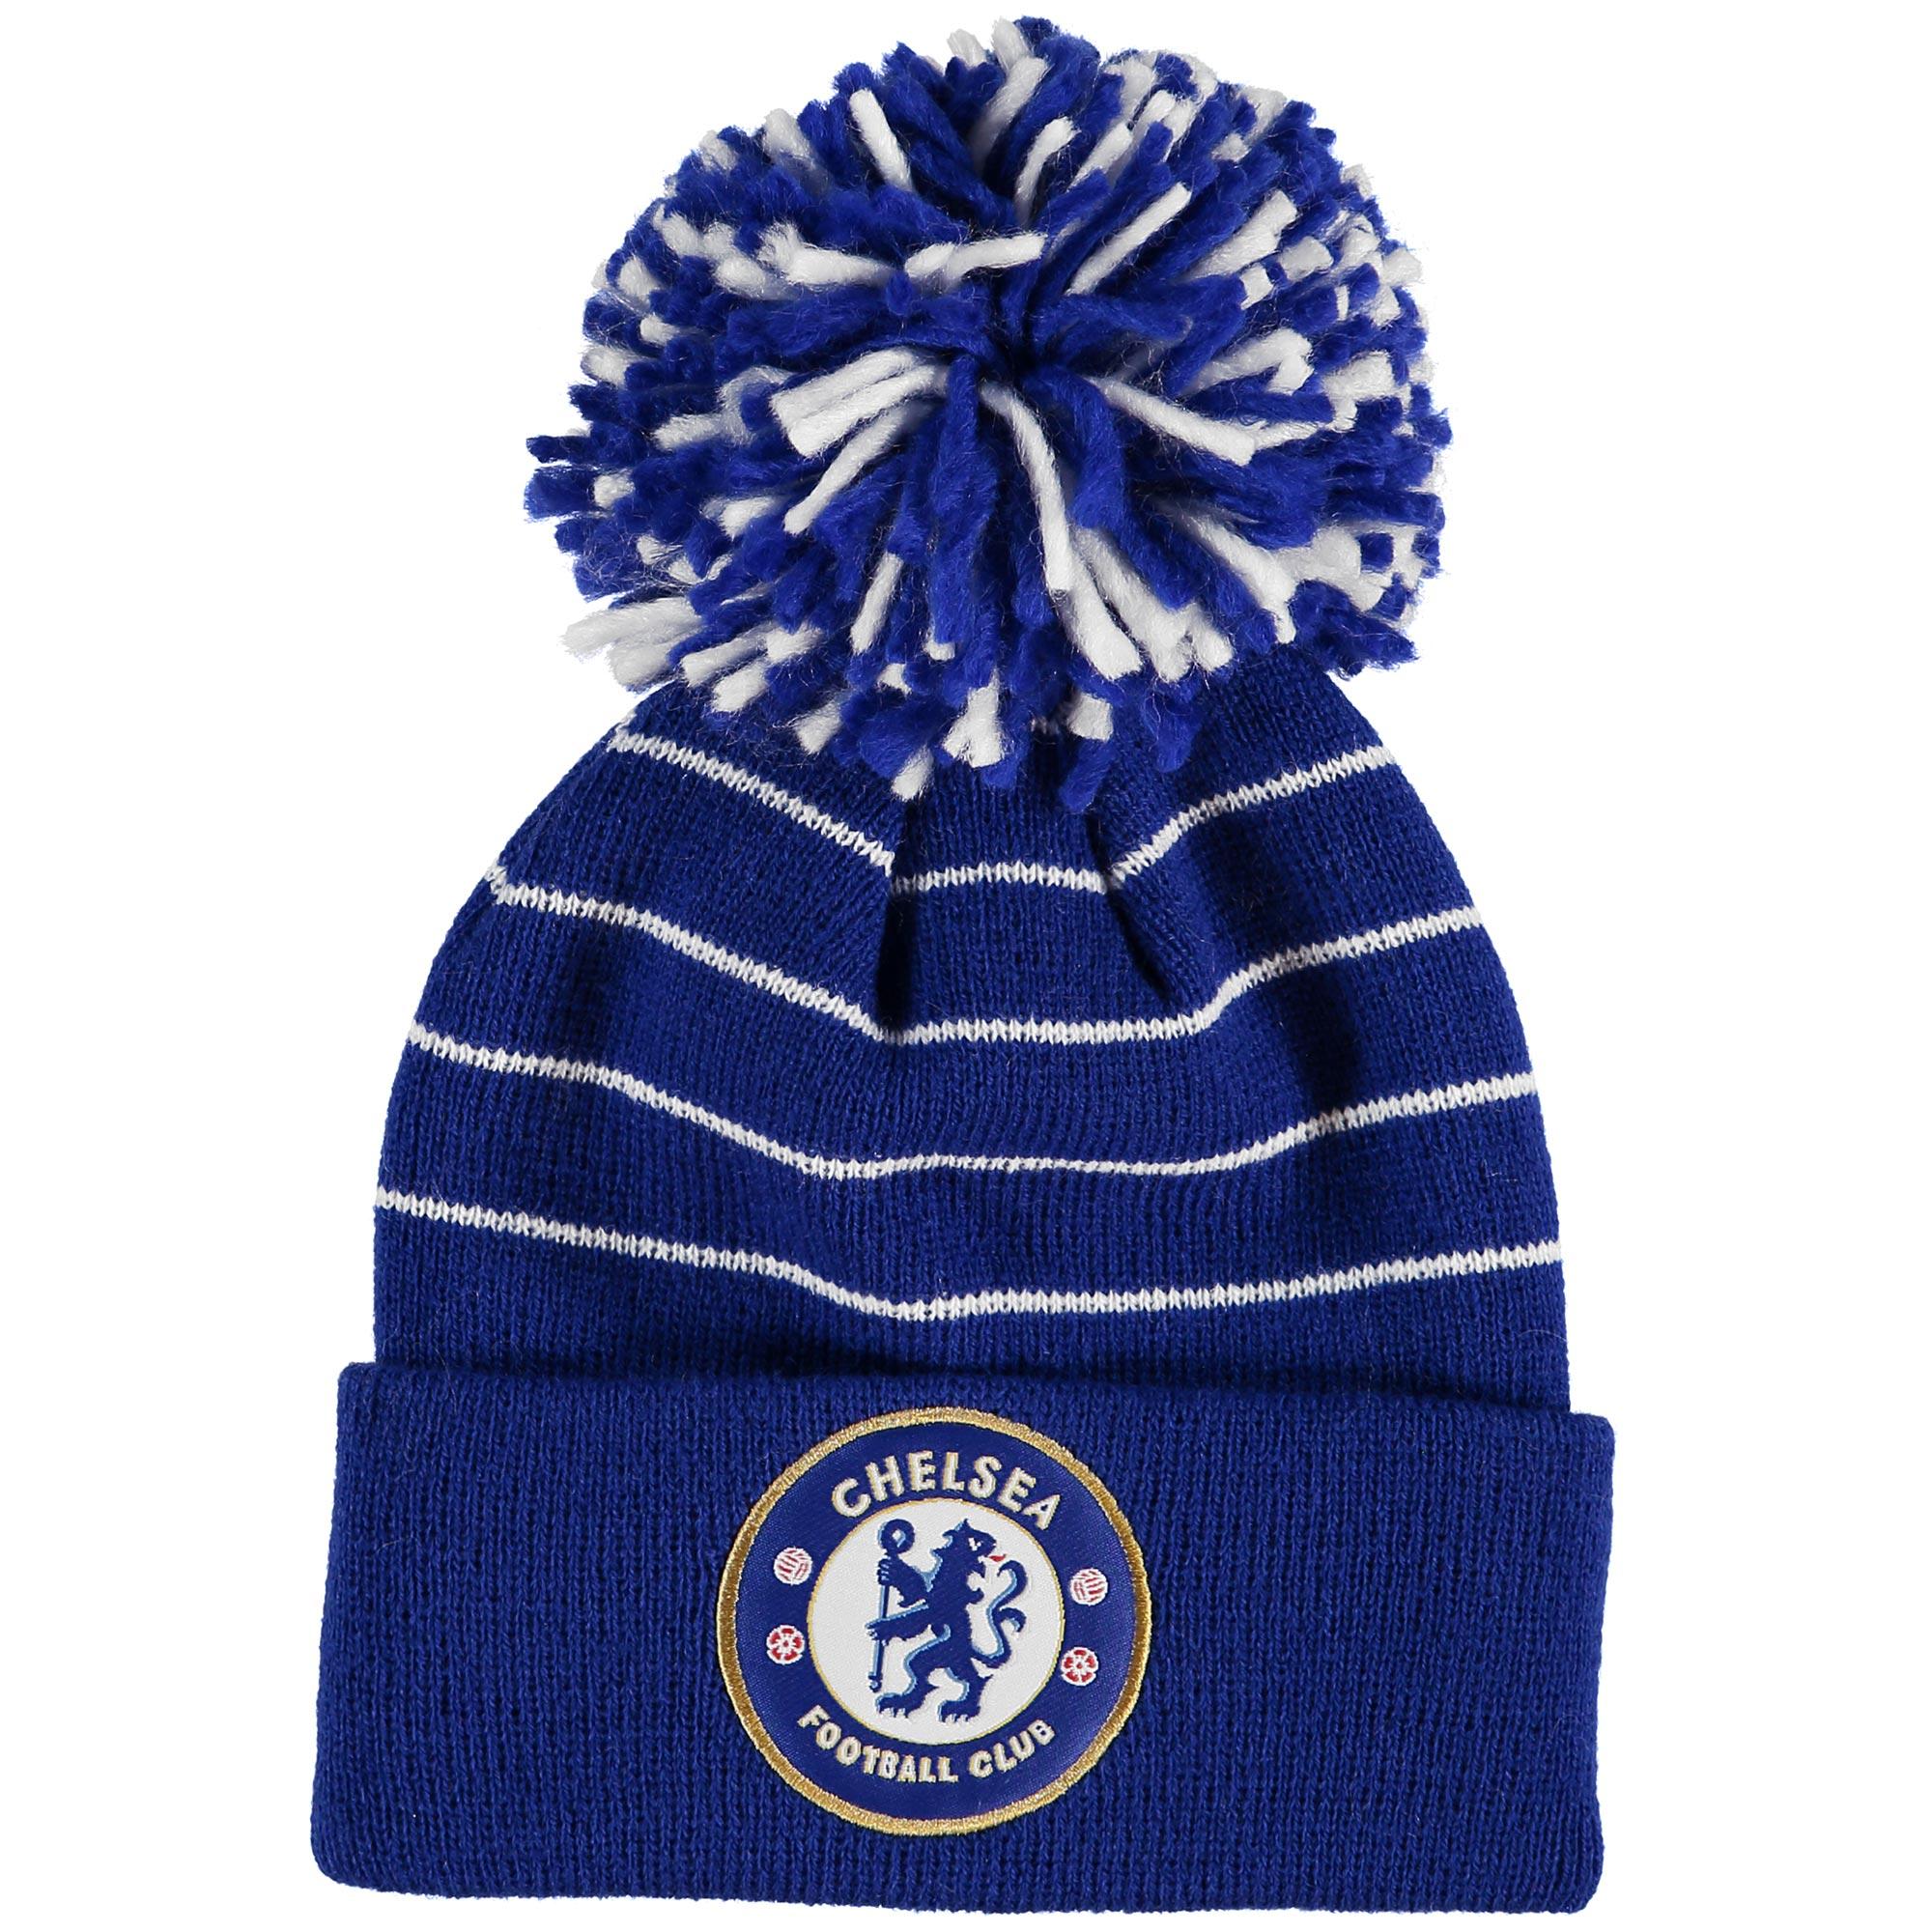 Chelsea Bobble Beanie Hat - Royal - Infants